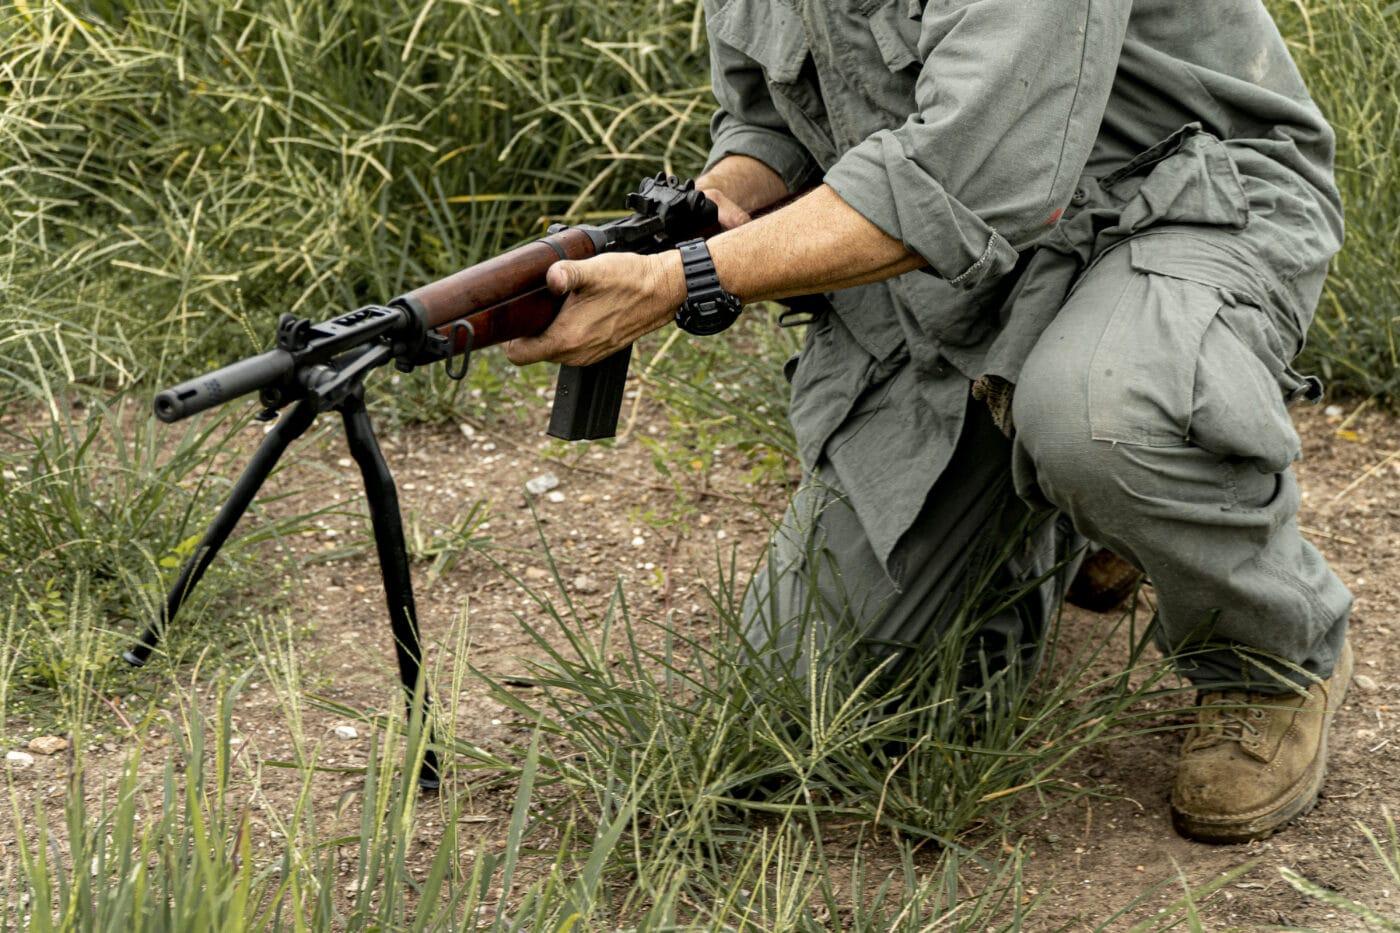 Man carrying an Italian battle rifle